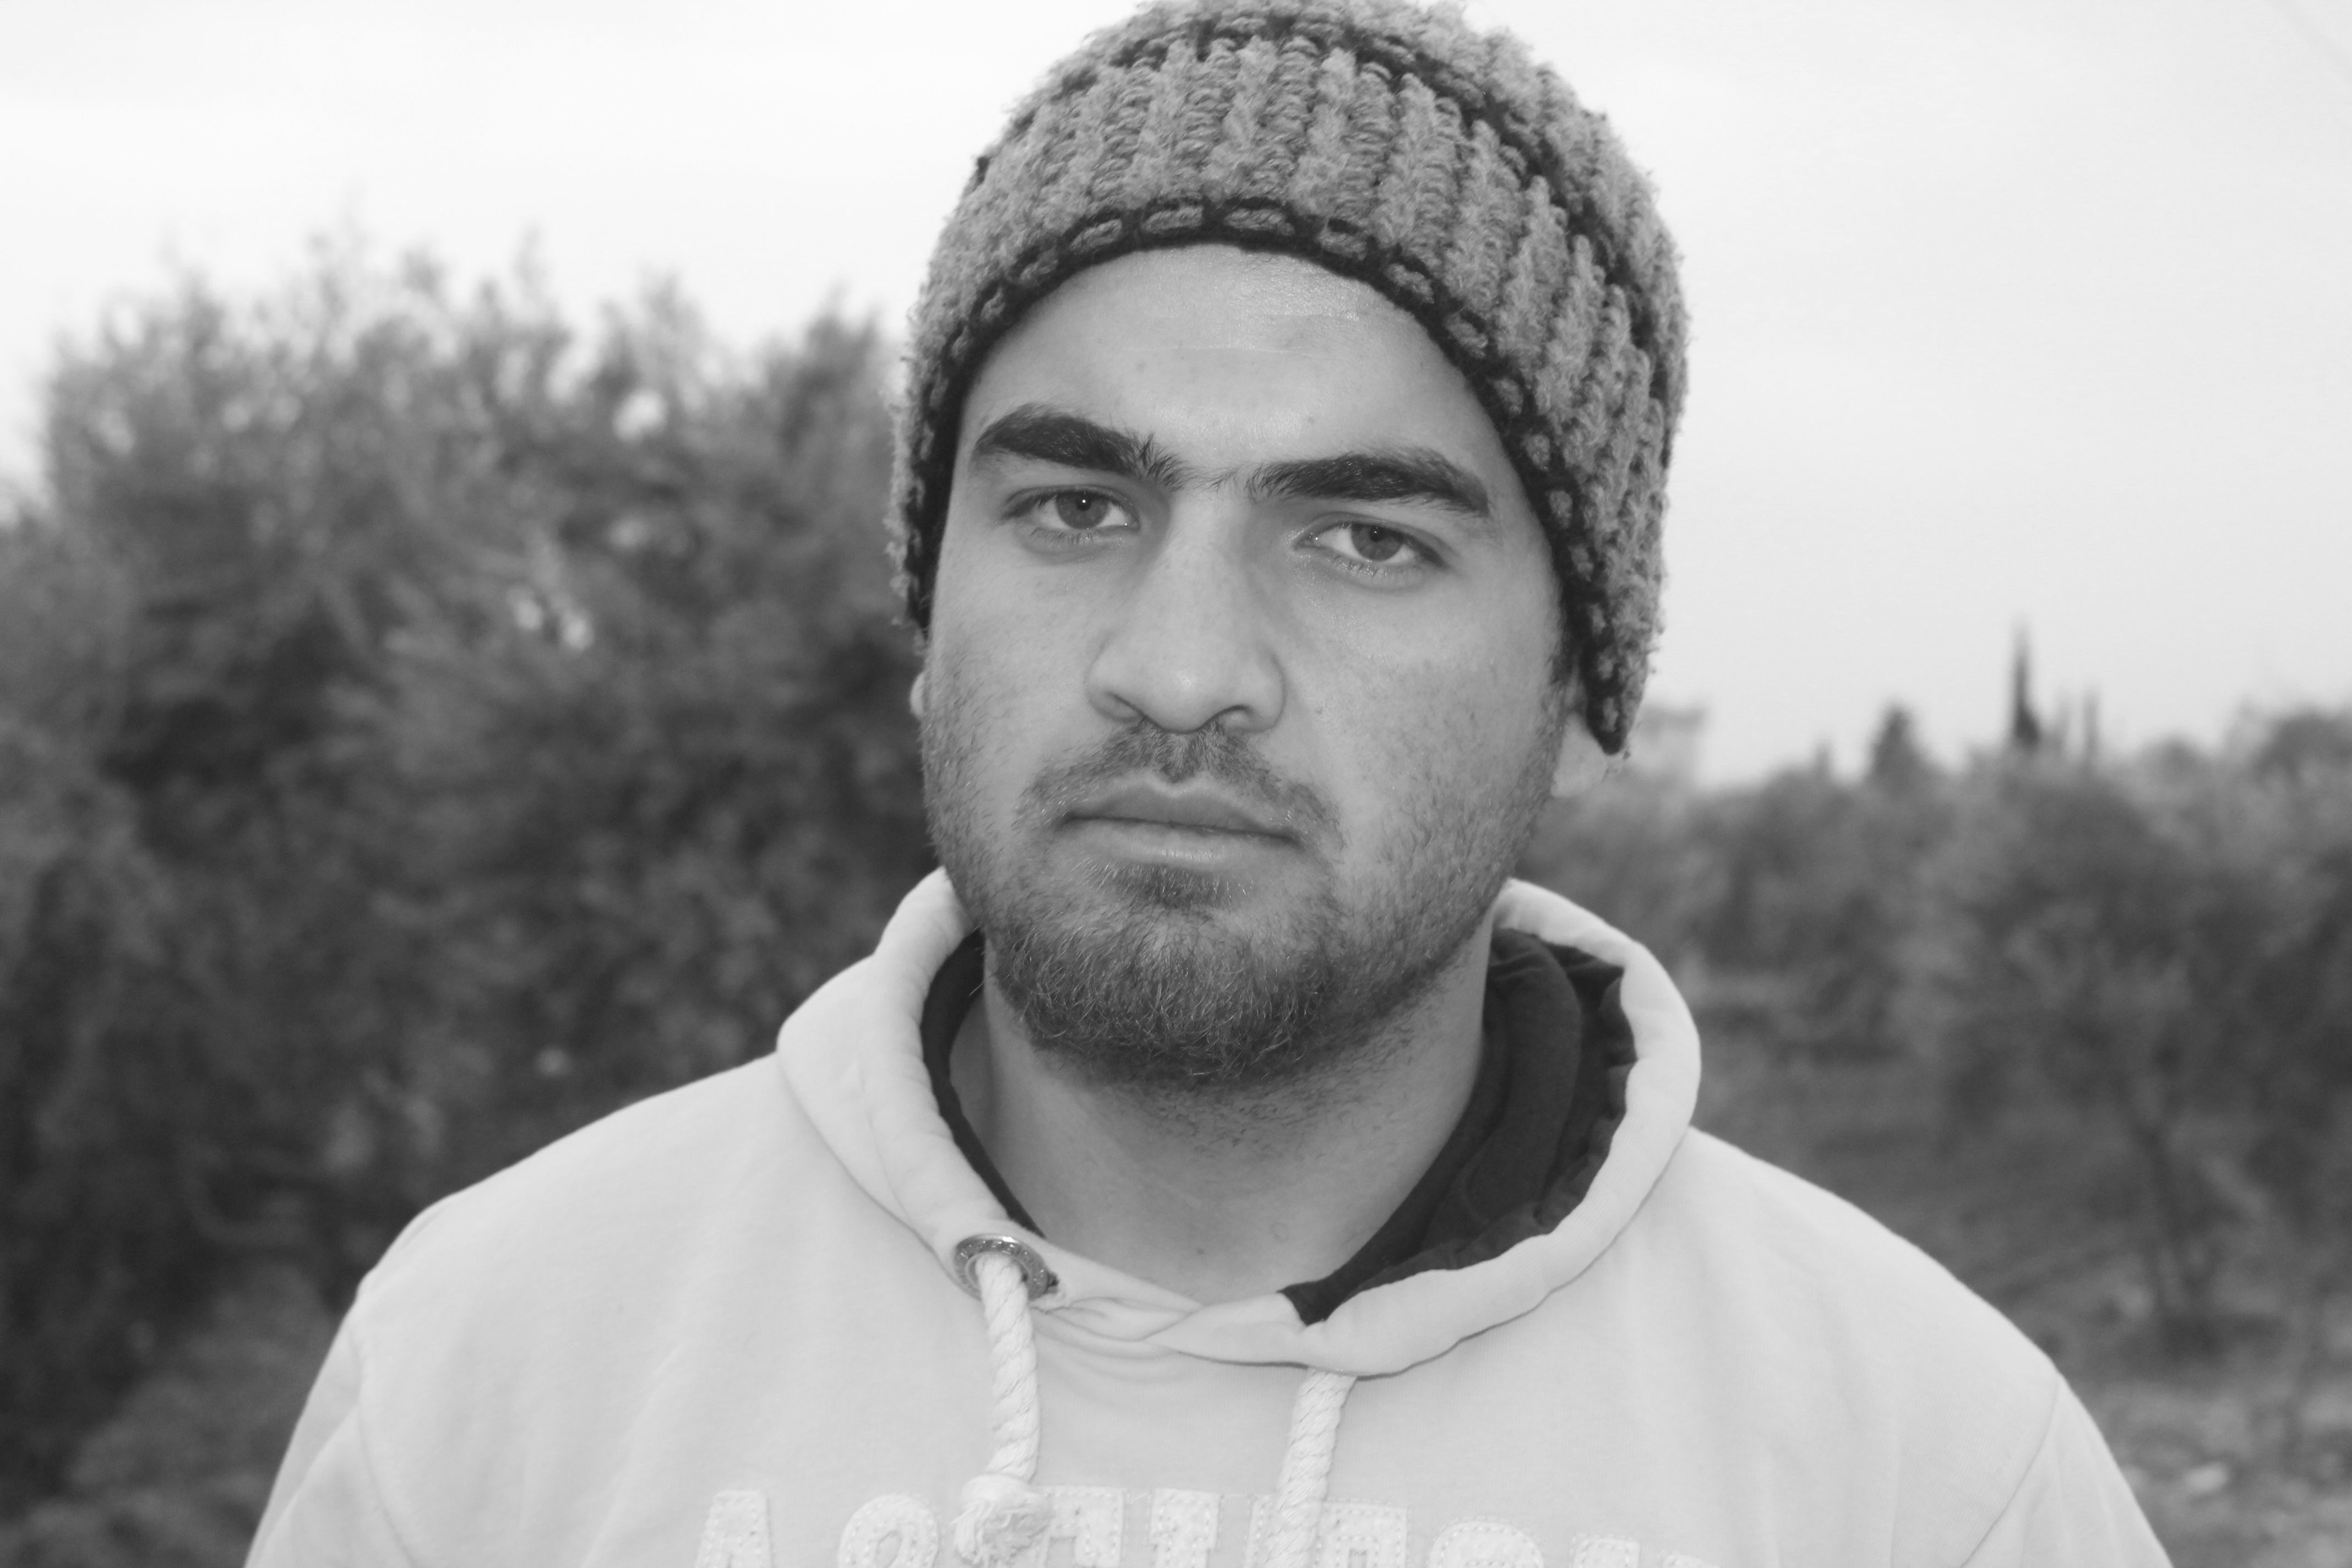 ليث محمود شعبان  Headshot